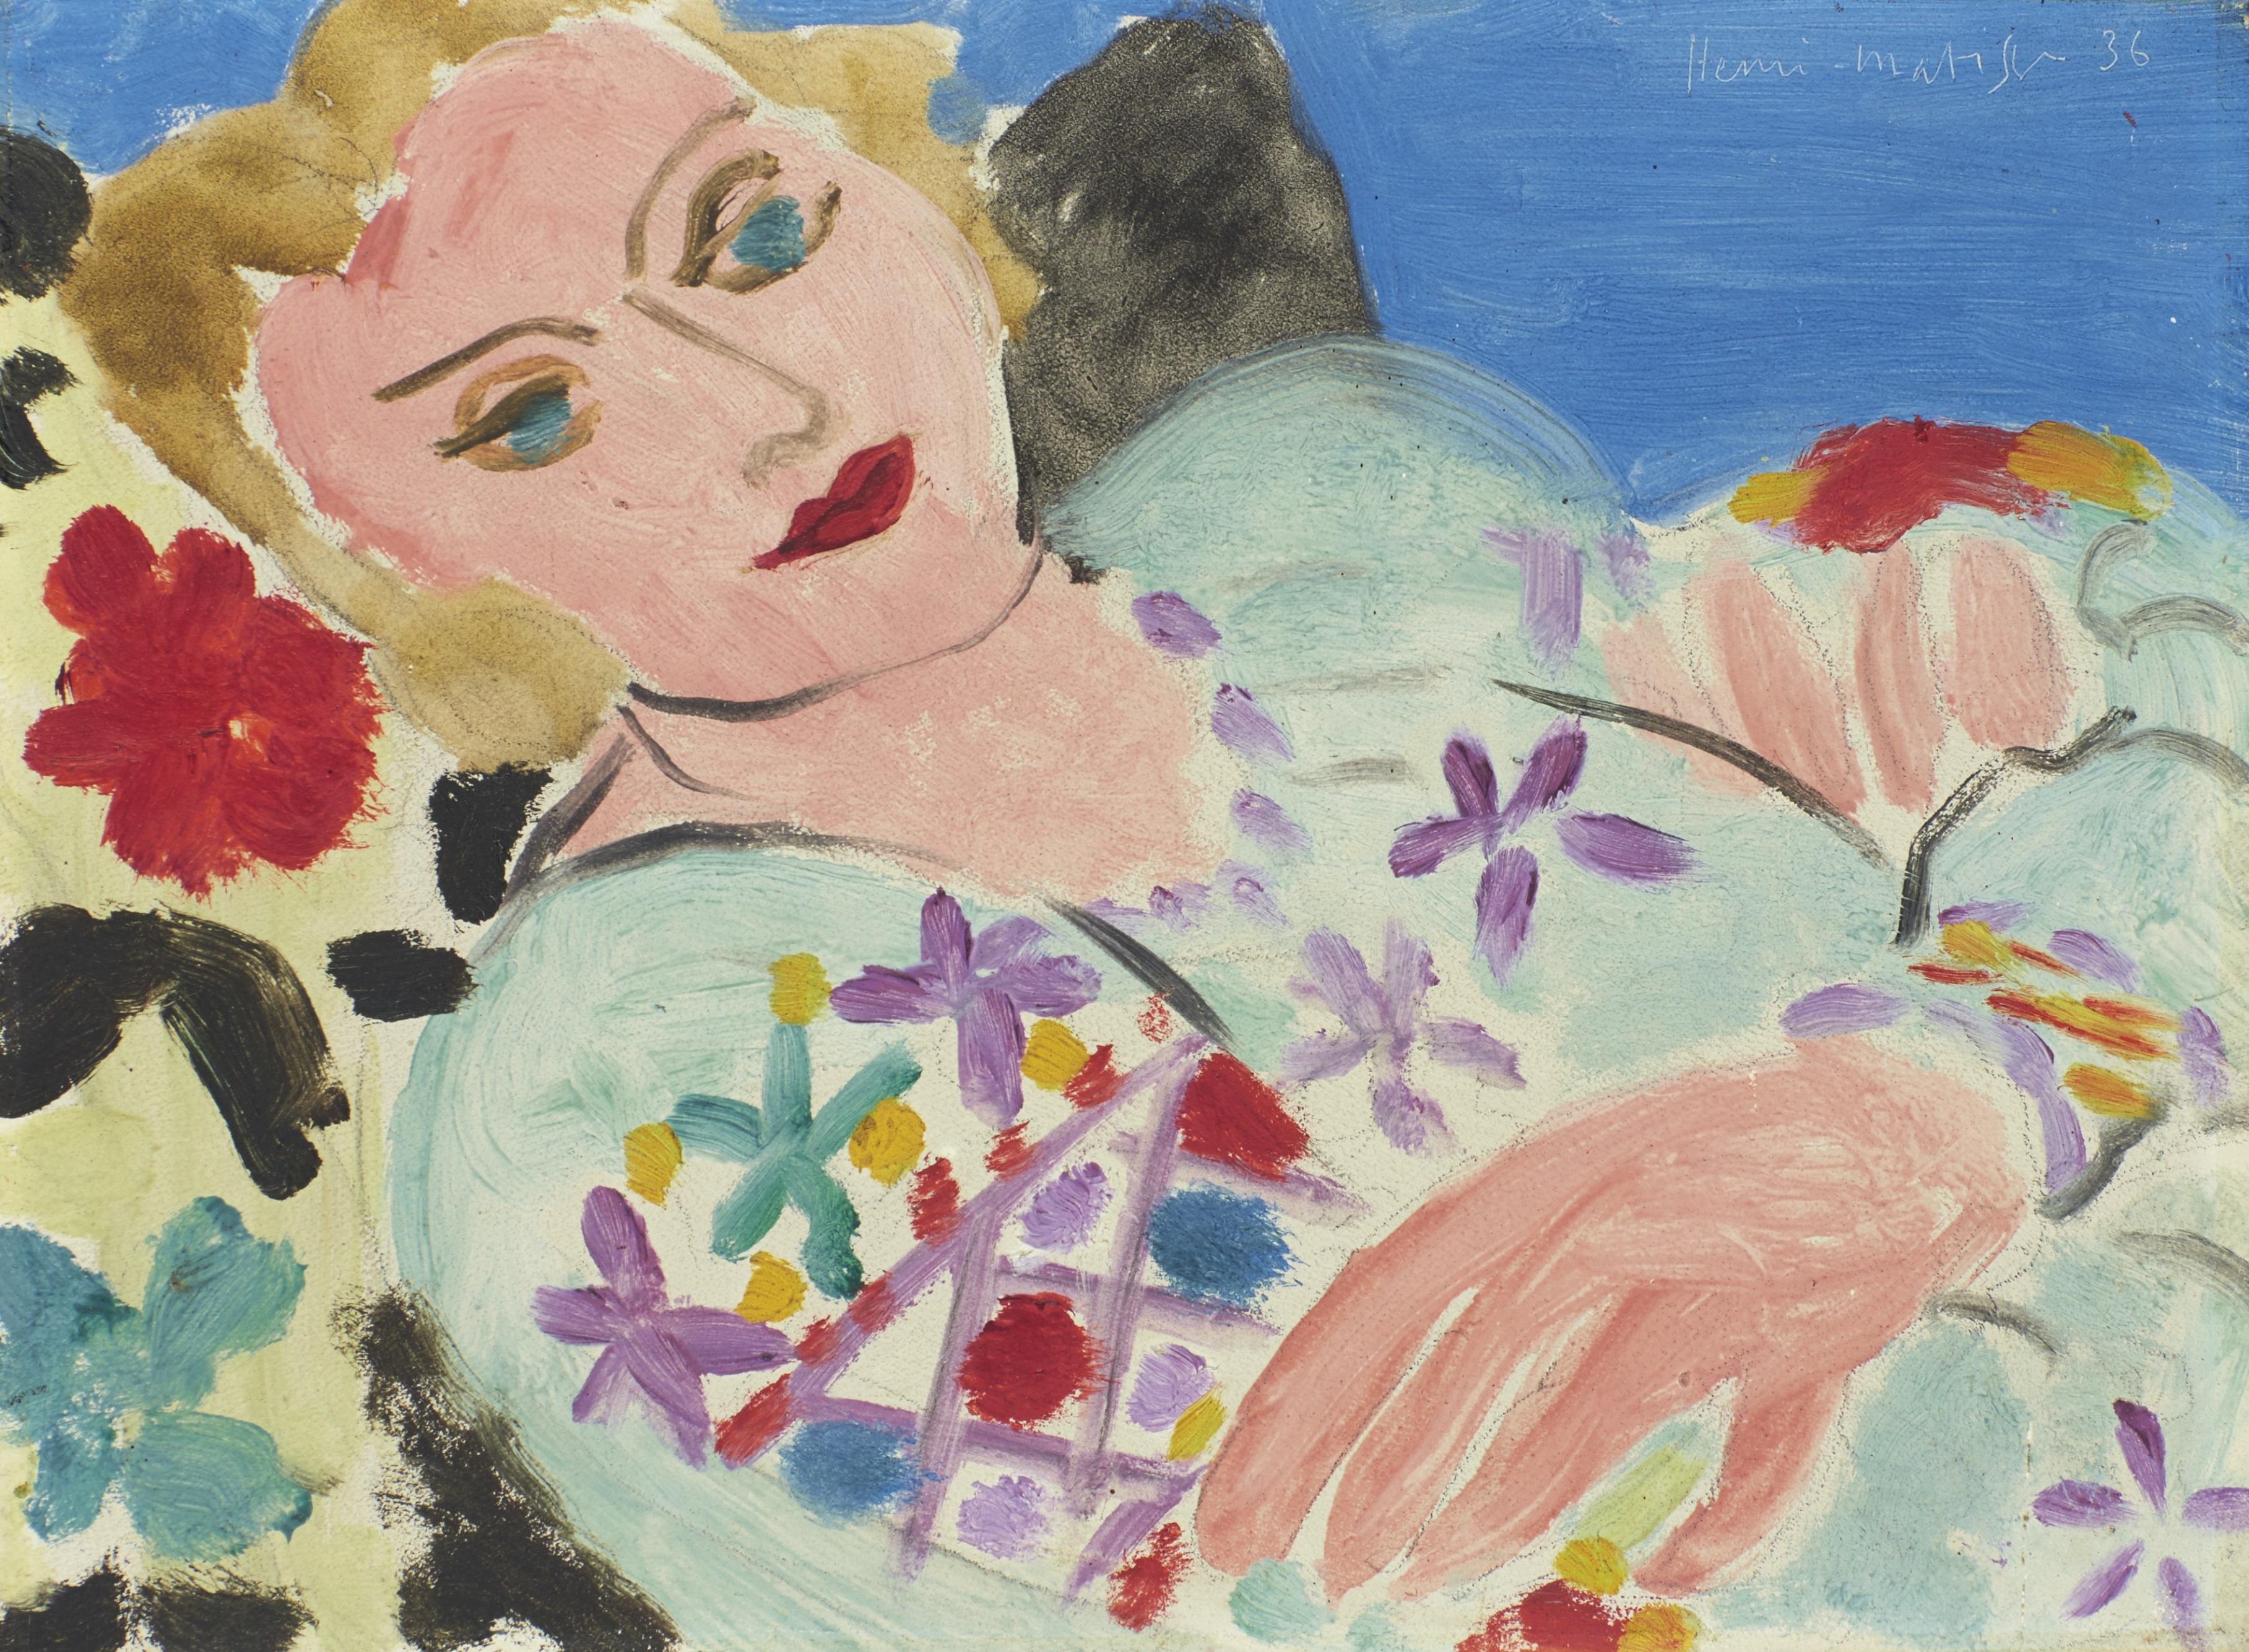 Henri Matisse - La Blouse Verte Brodée